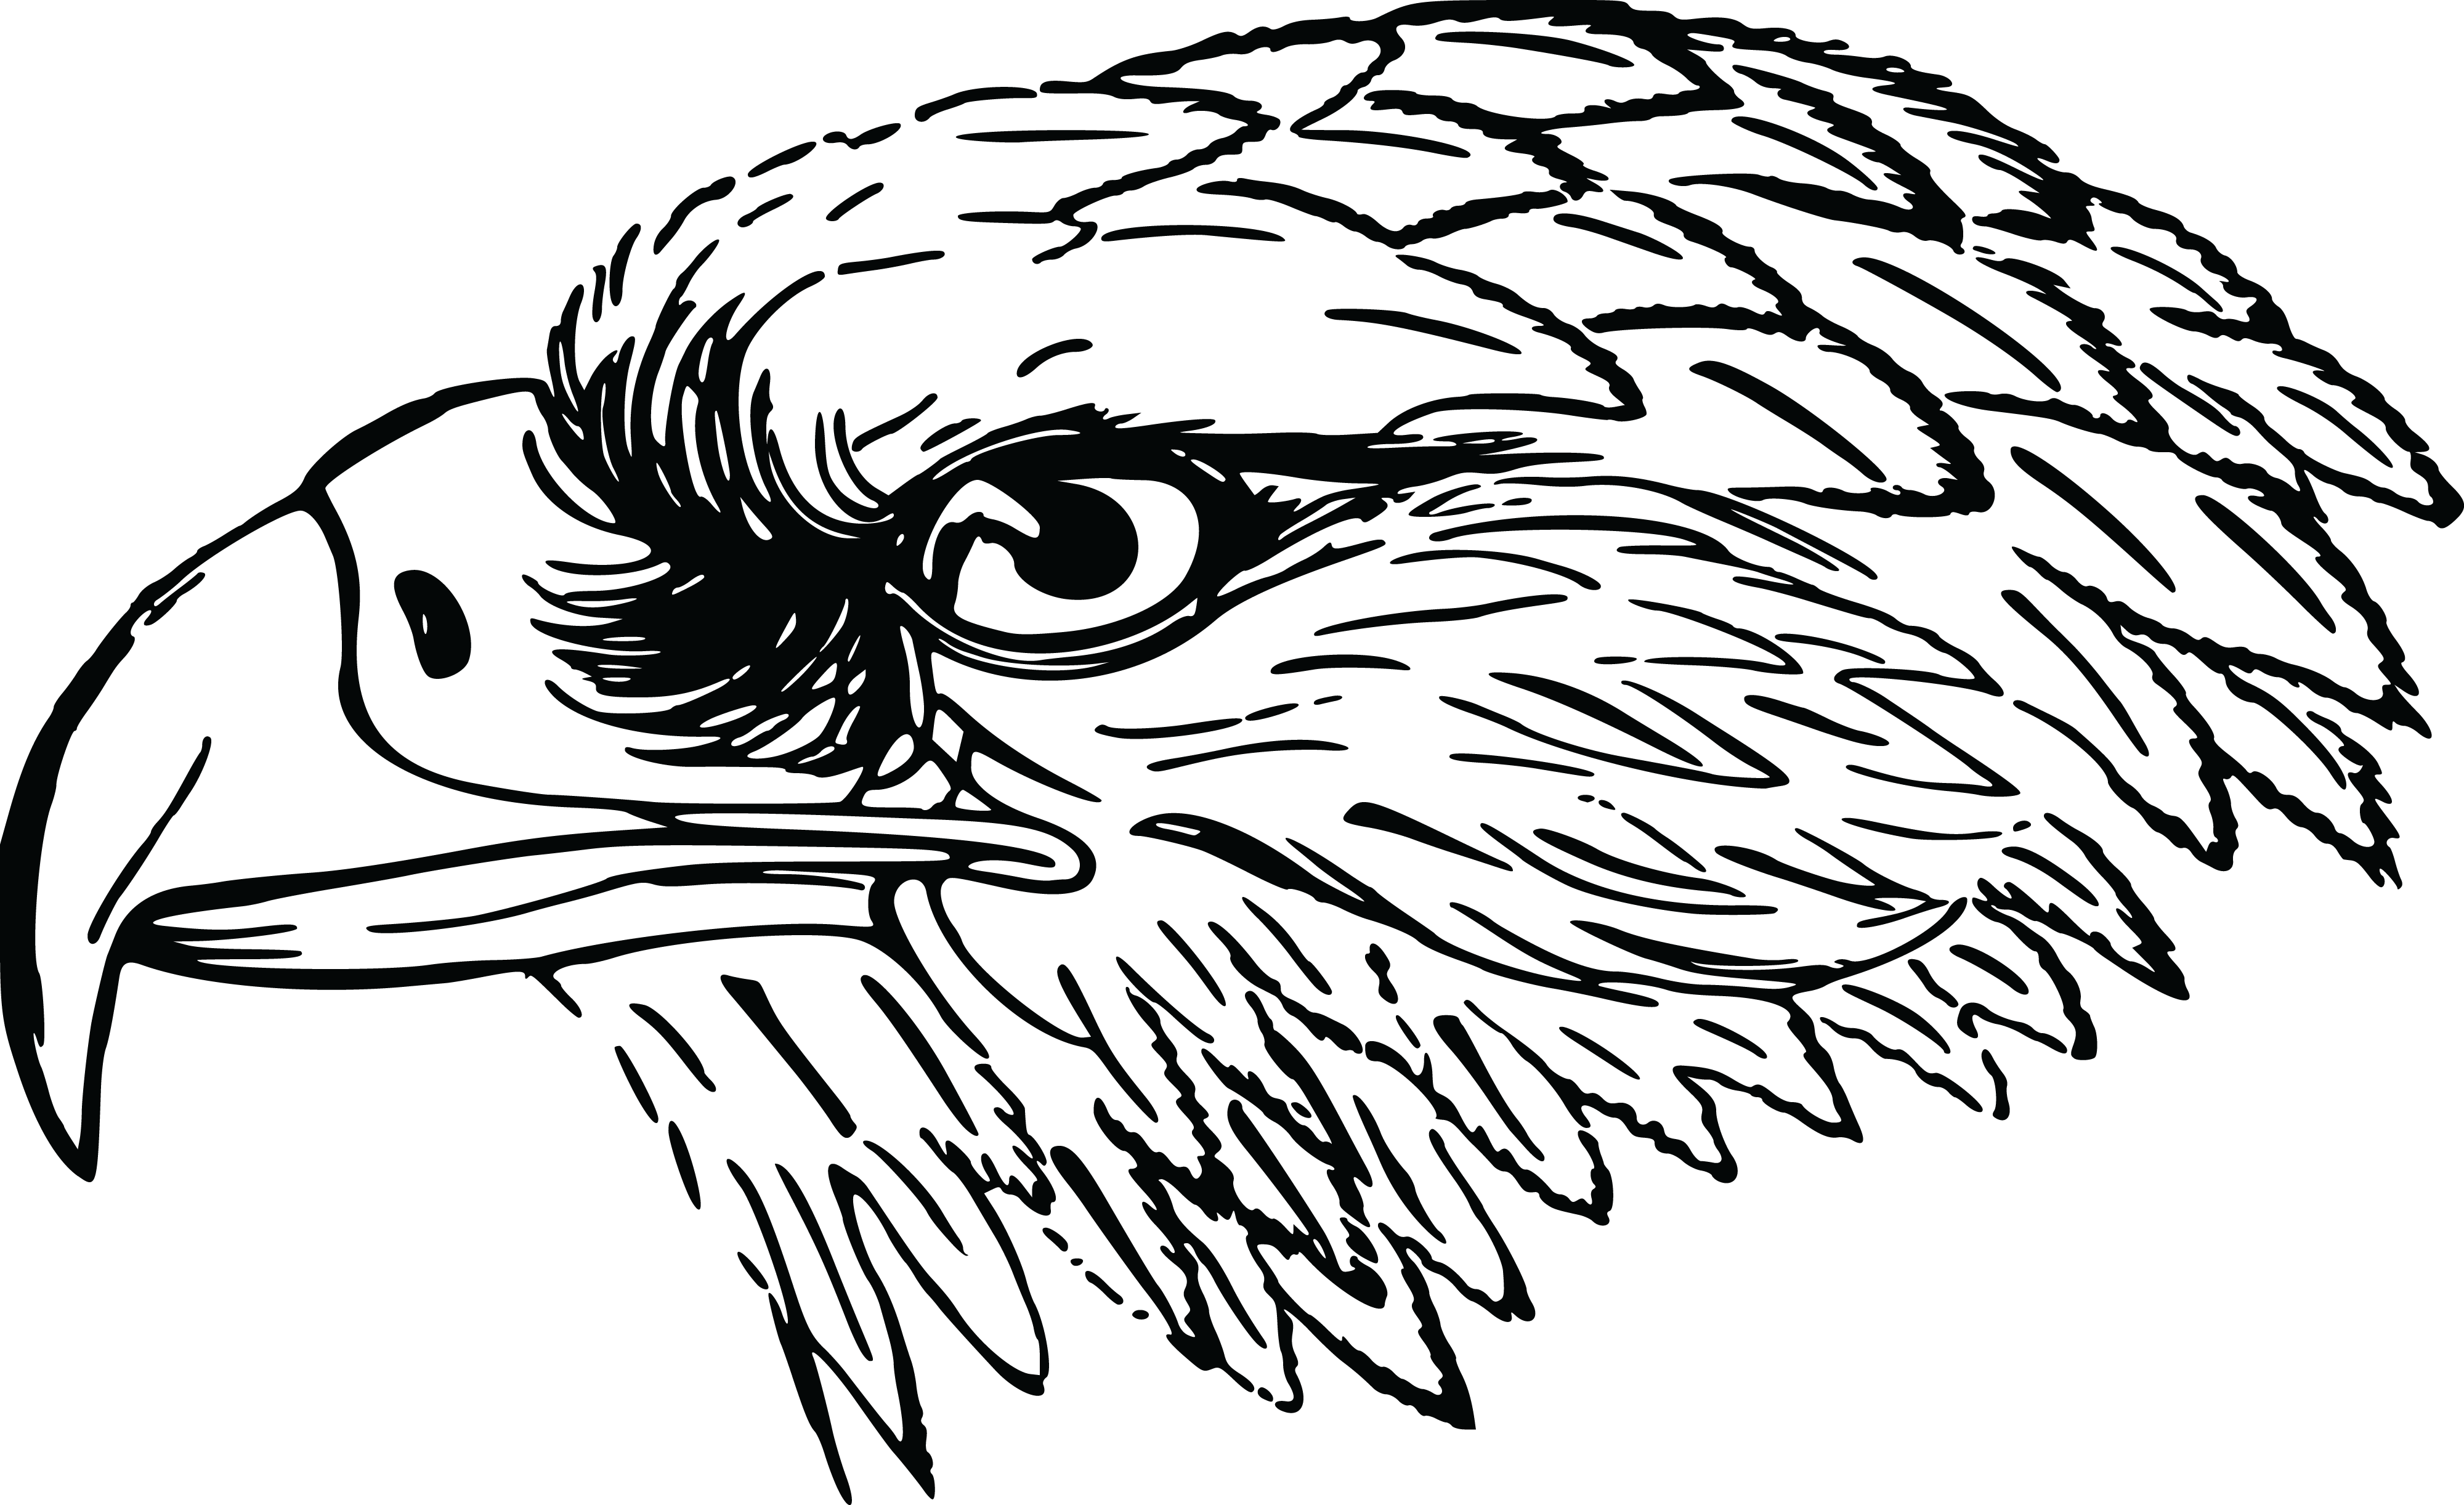 Pumpkin clipart black and white jep banner black and white Eagle Clip Art Black and White | Free Clipart Of A Black and White ... banner black and white